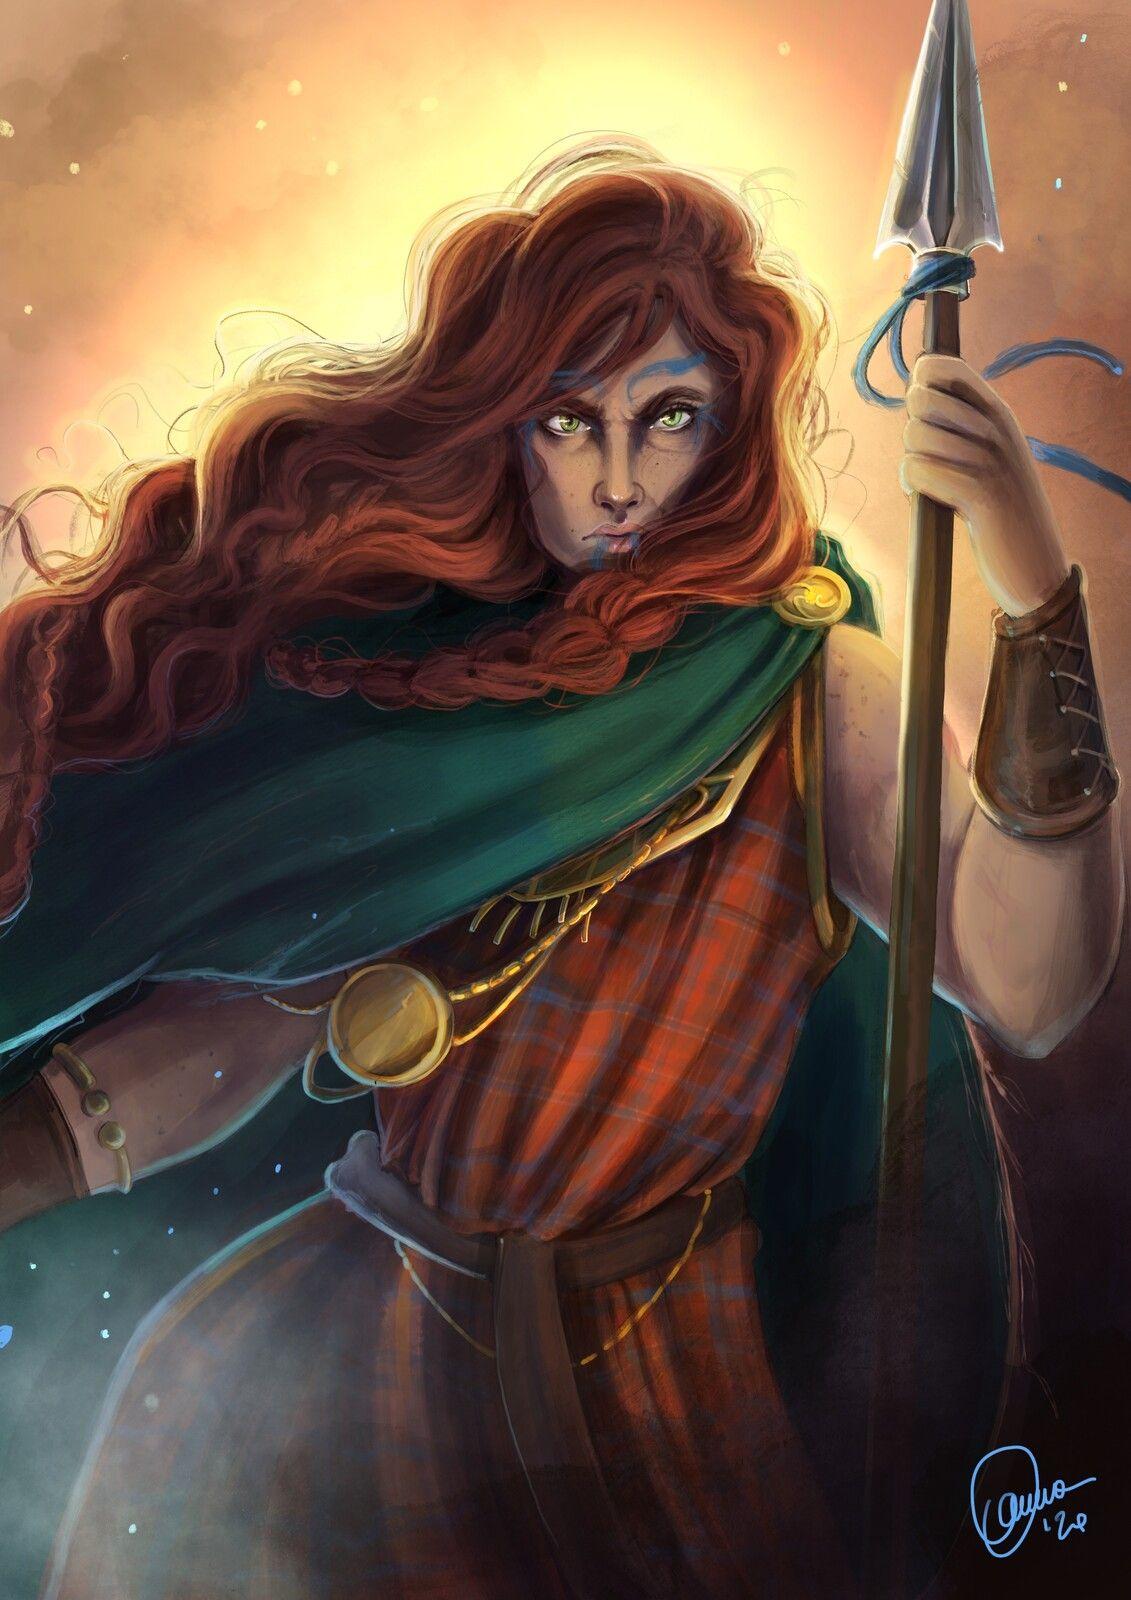 Boudicca Anna Schiliro On Artstation At Https Www Artstation Com Artwork Xzakwm Celtic Warriors Celtic Gods Warrior Woman